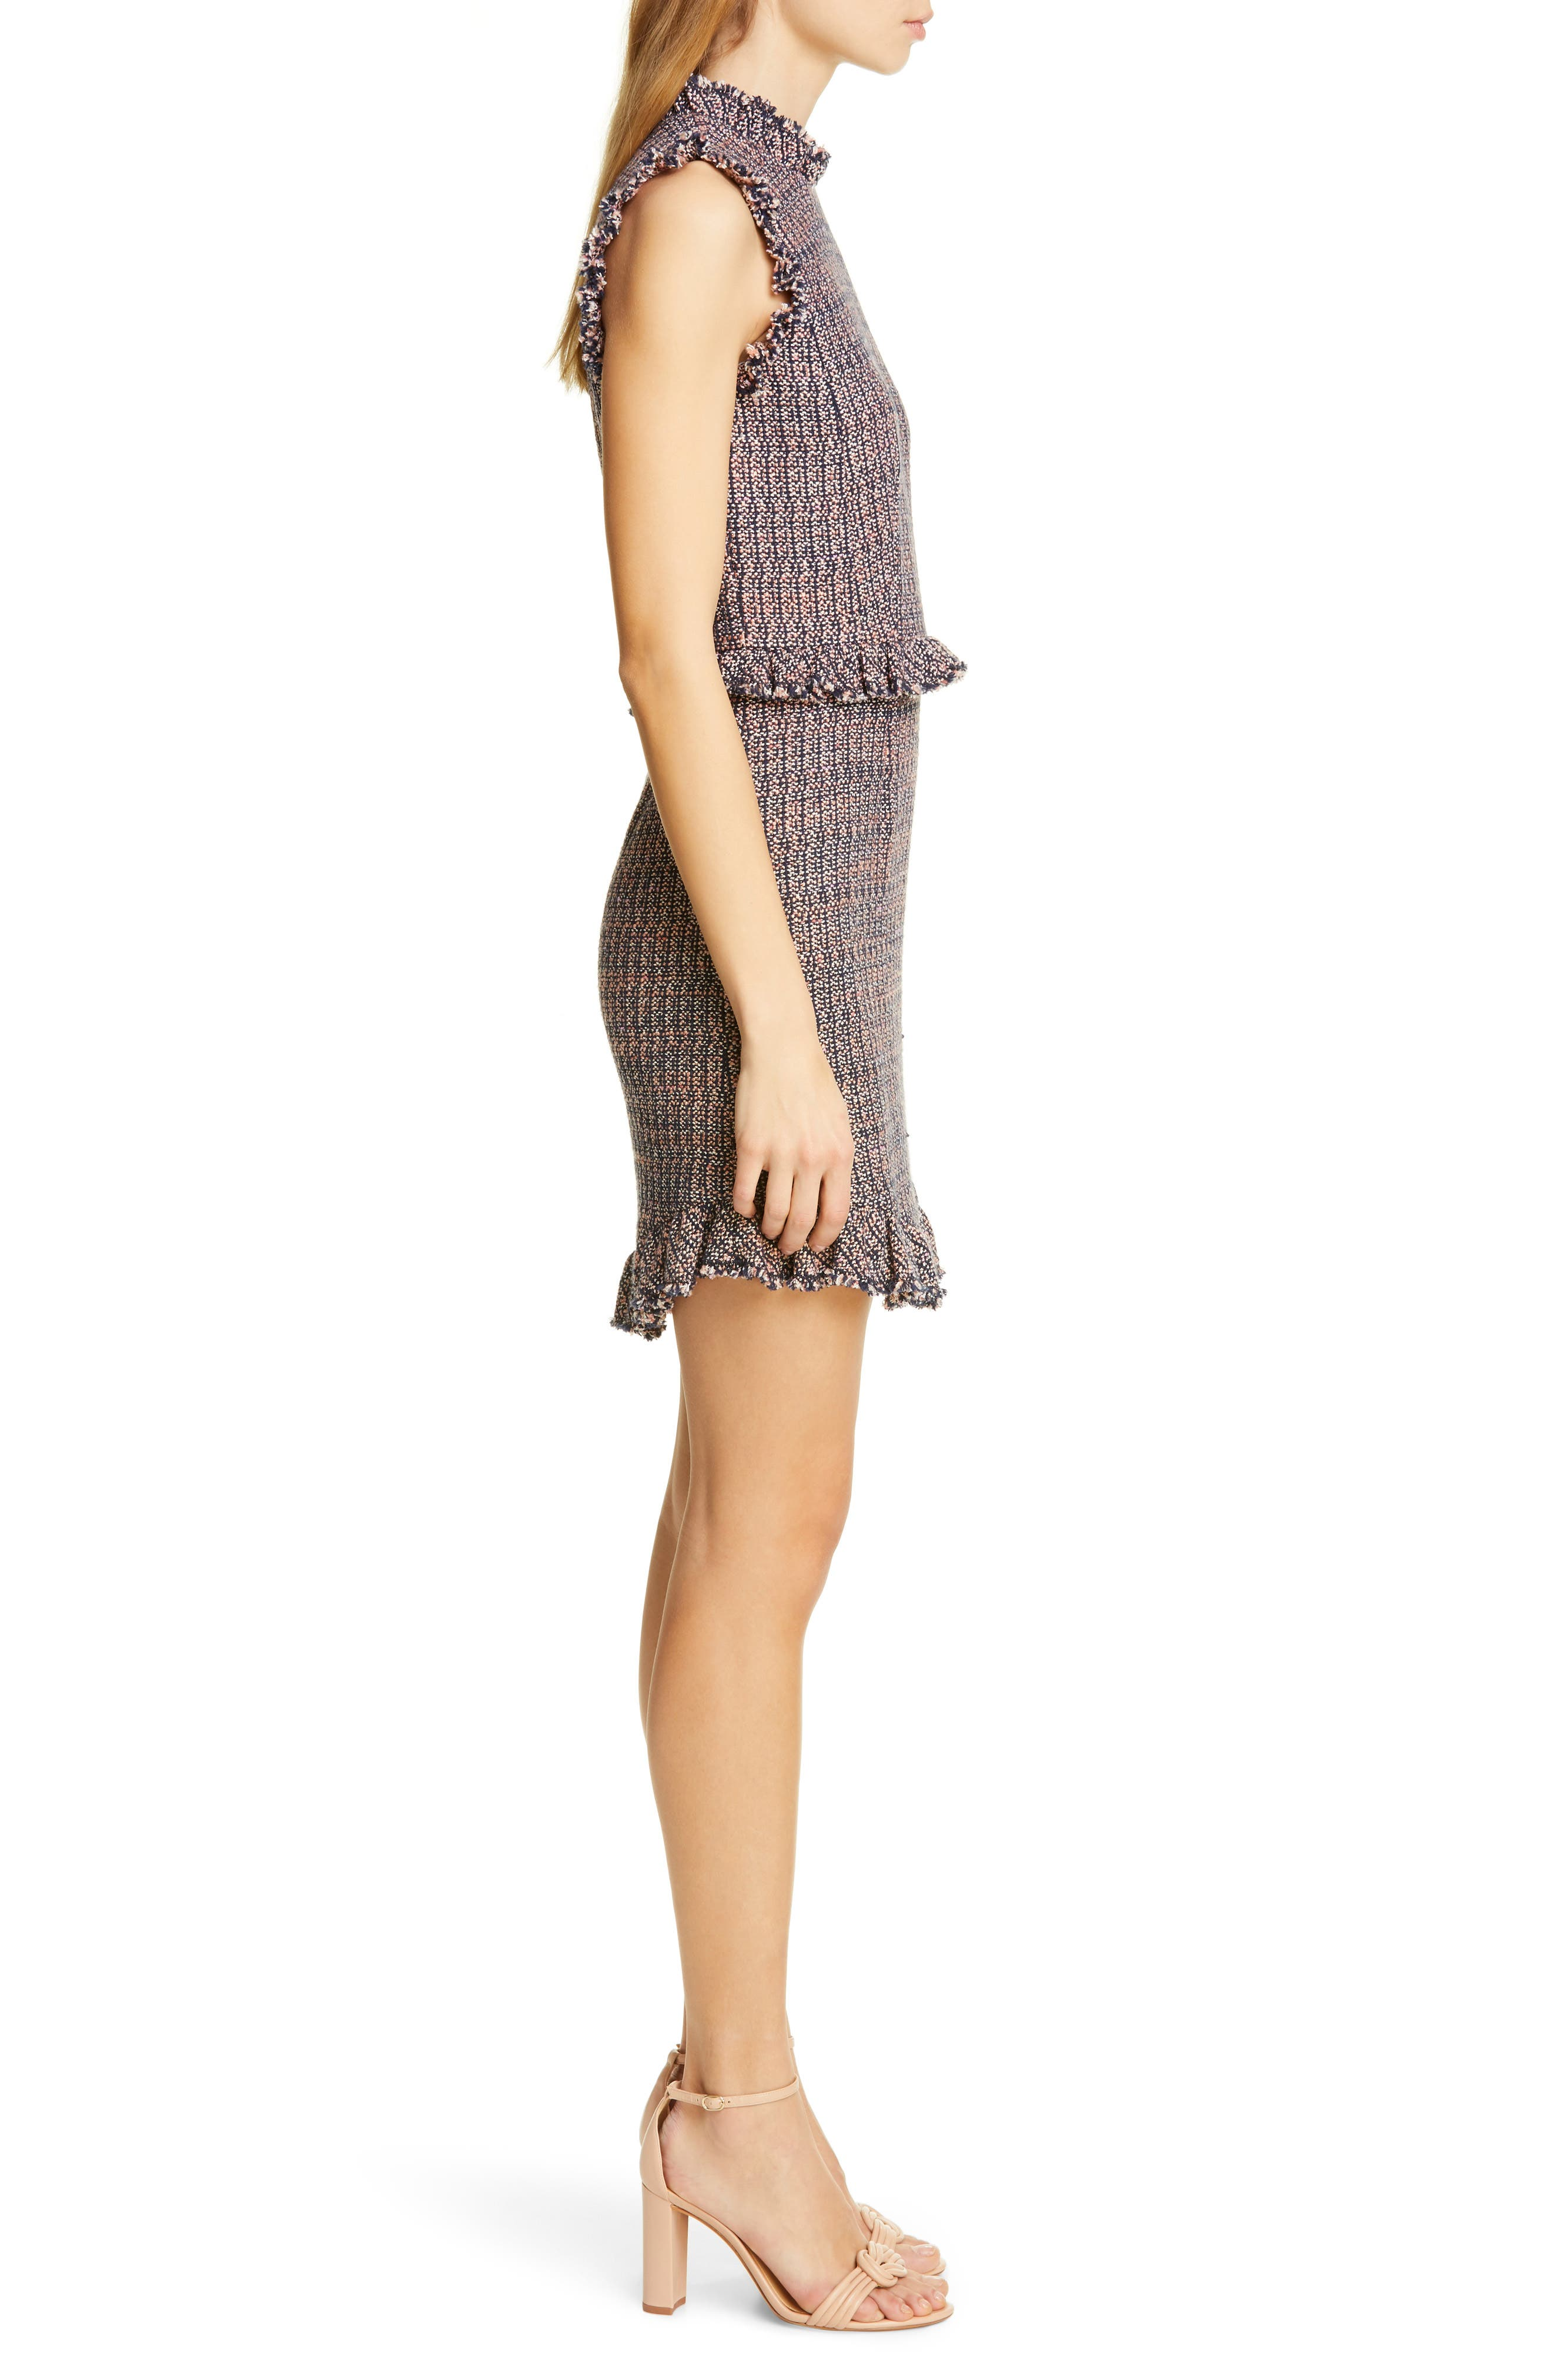 REBECCA TAYLOR, Frayed Ruffle Tweed Dress, Alternate thumbnail 4, color, PINK/ NAVY COMBO